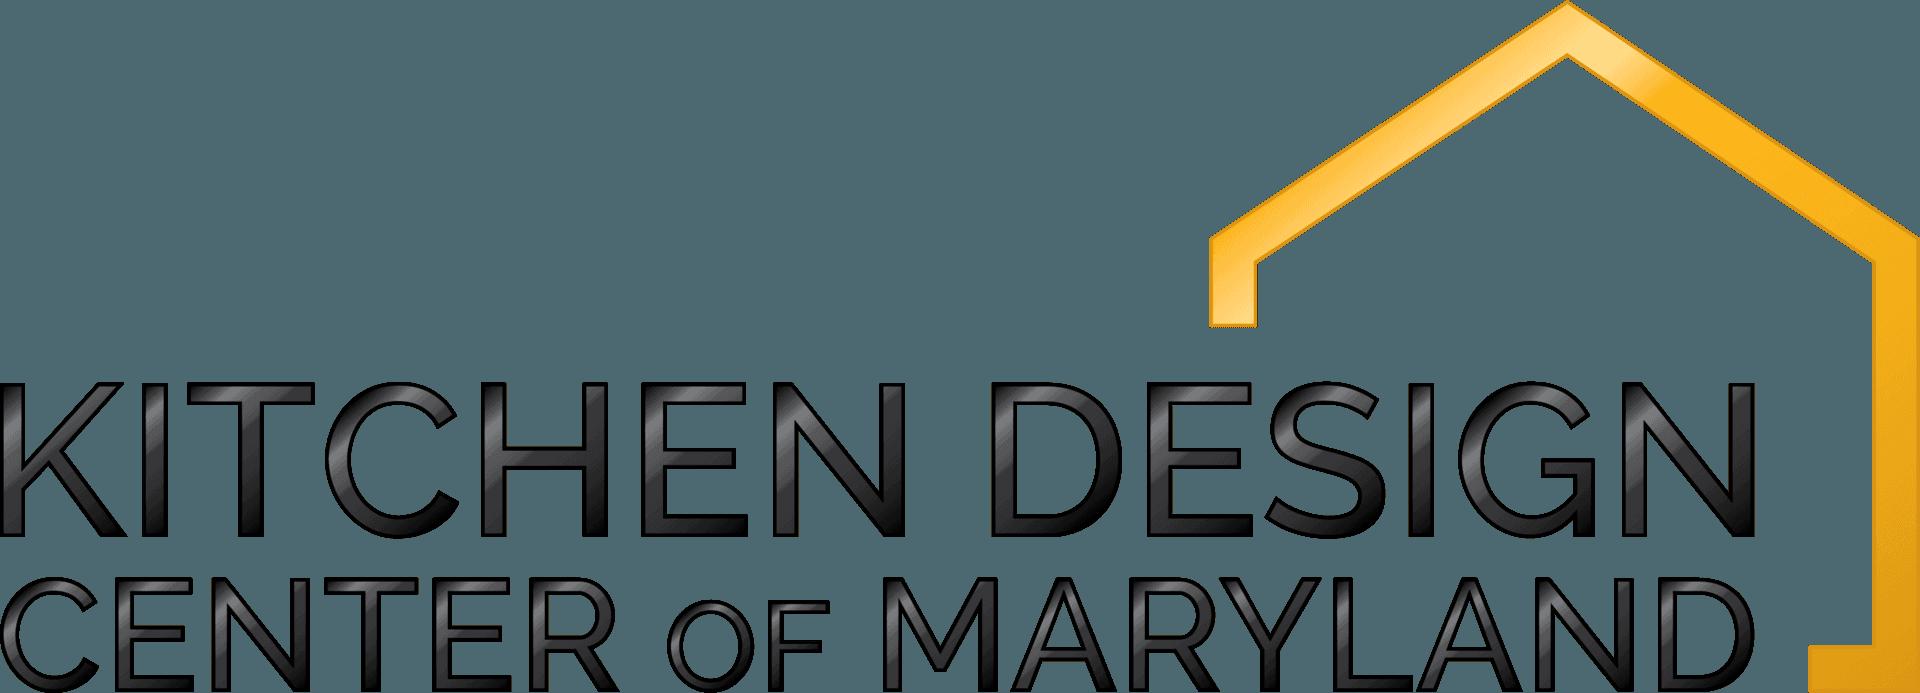 Kitchen Design Center Of Maryland Remodeling Renovations